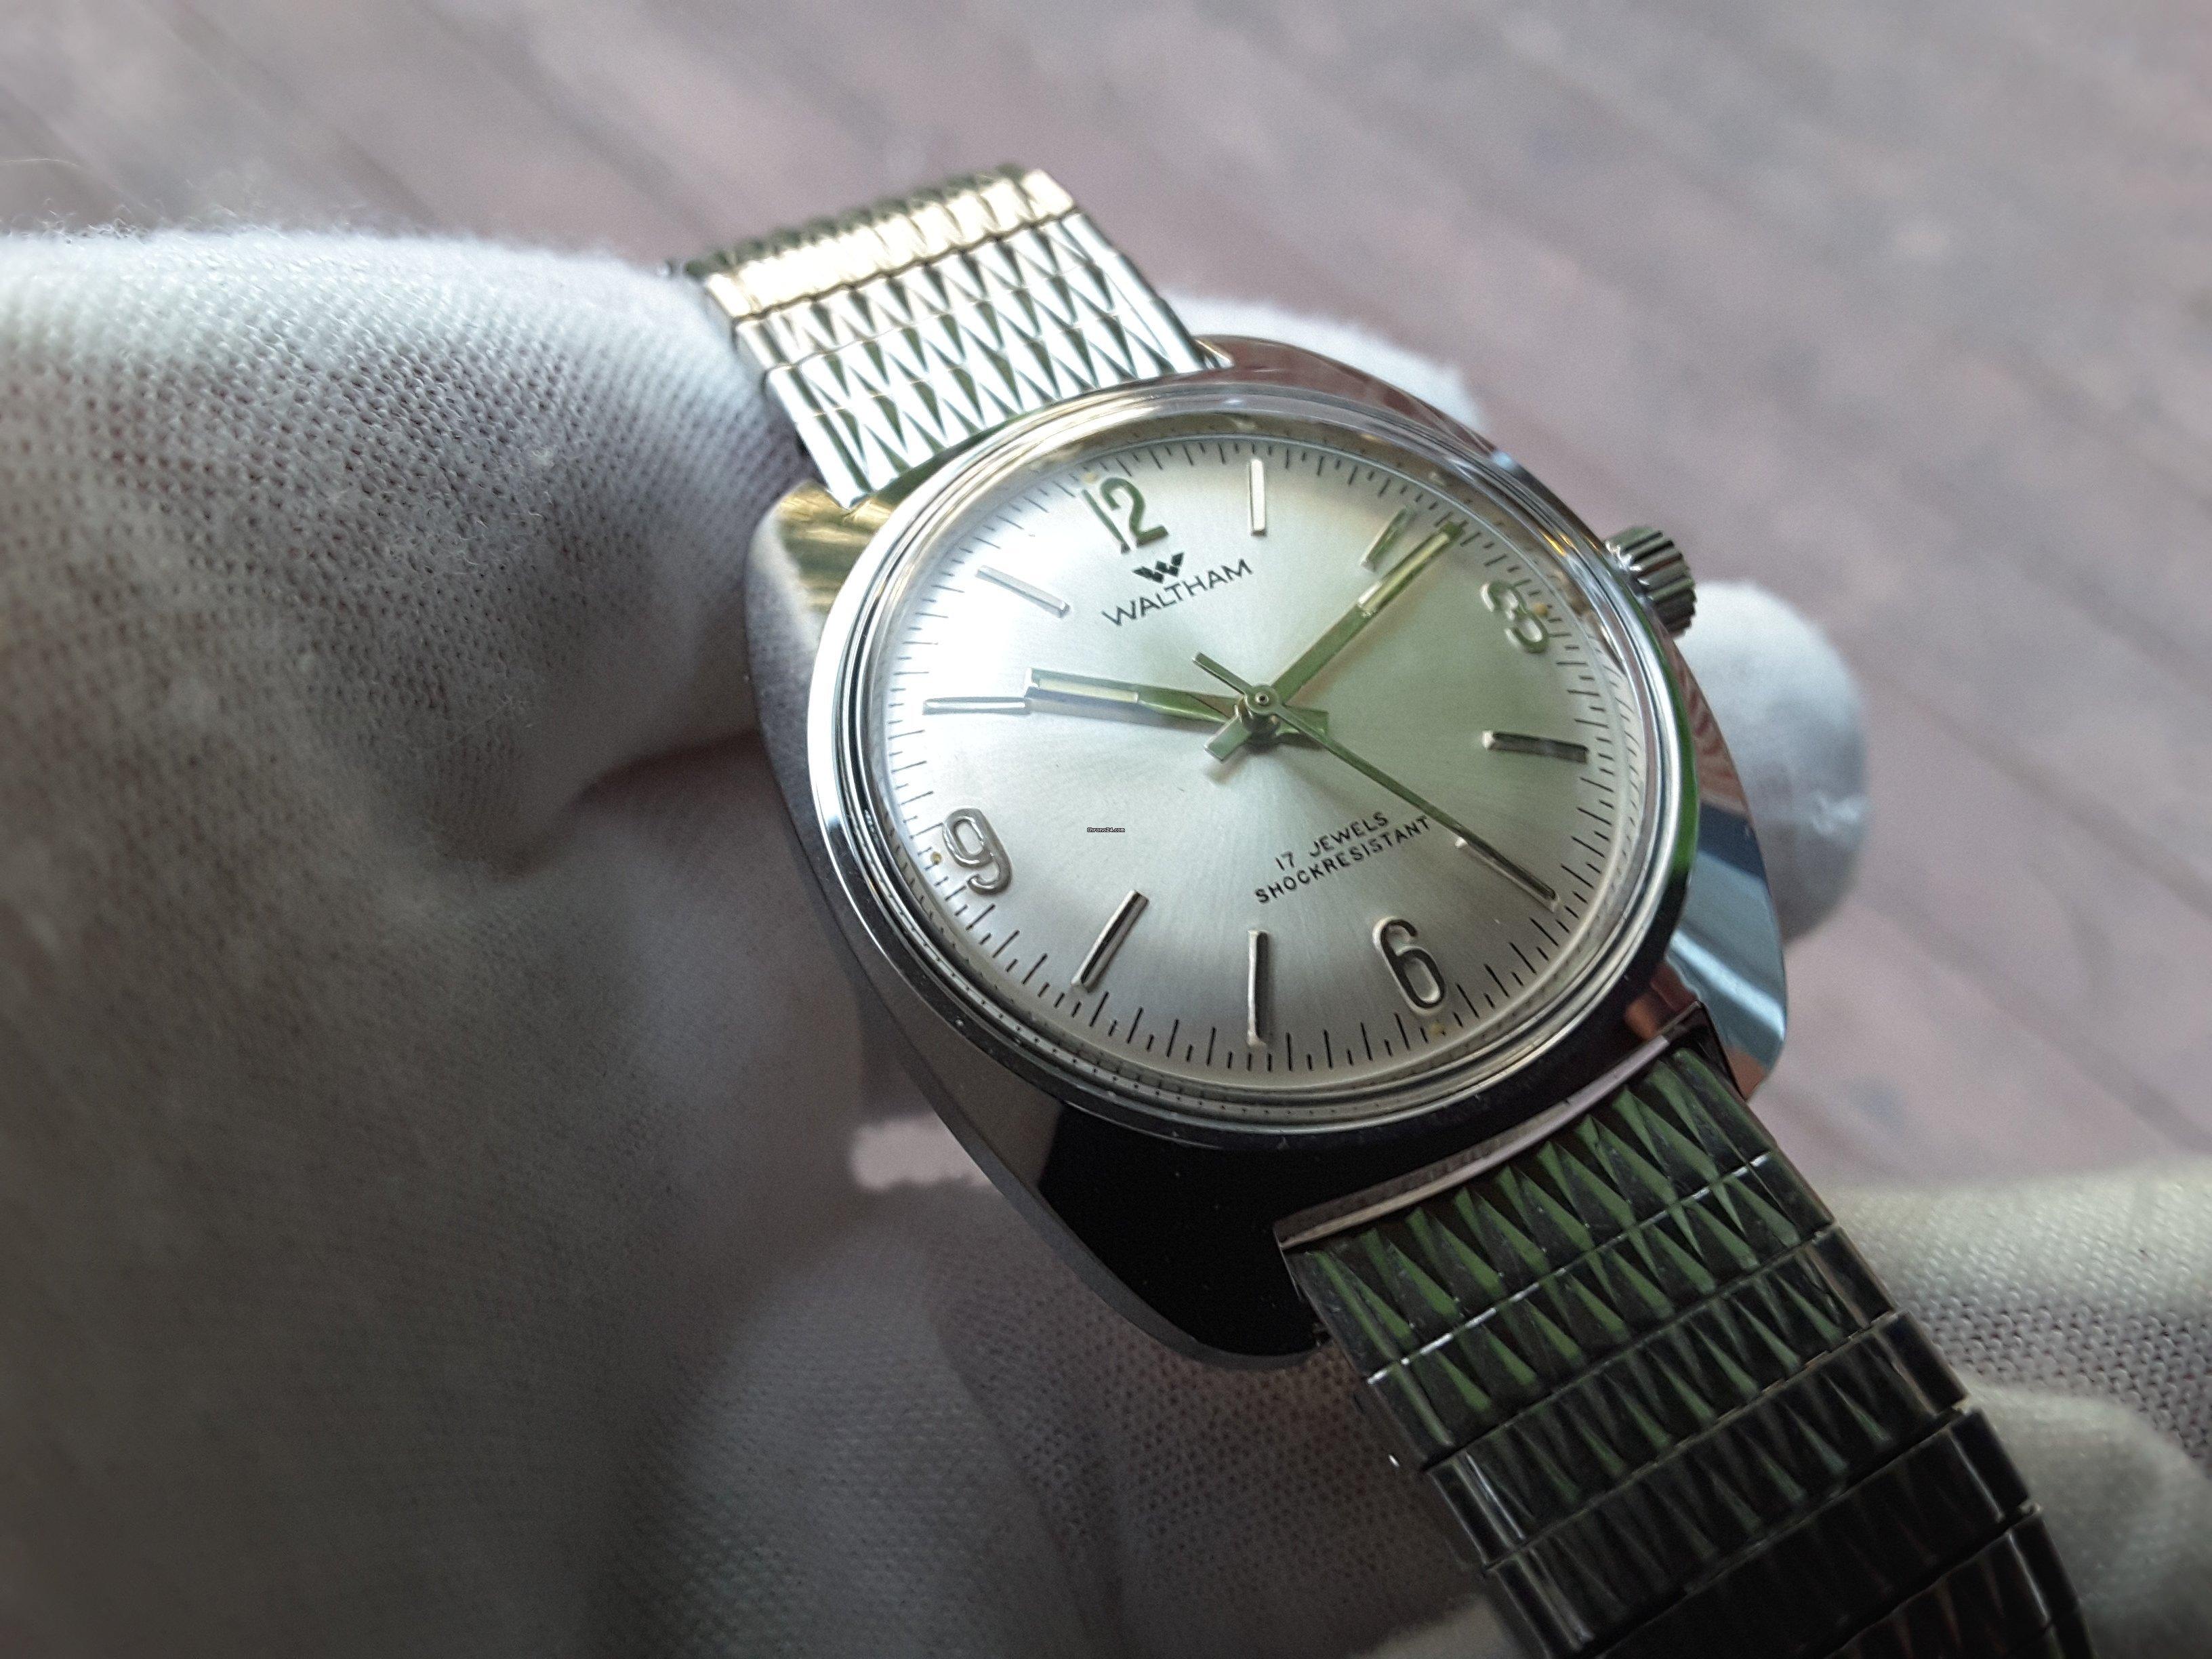 Waltham armbåndsur dating